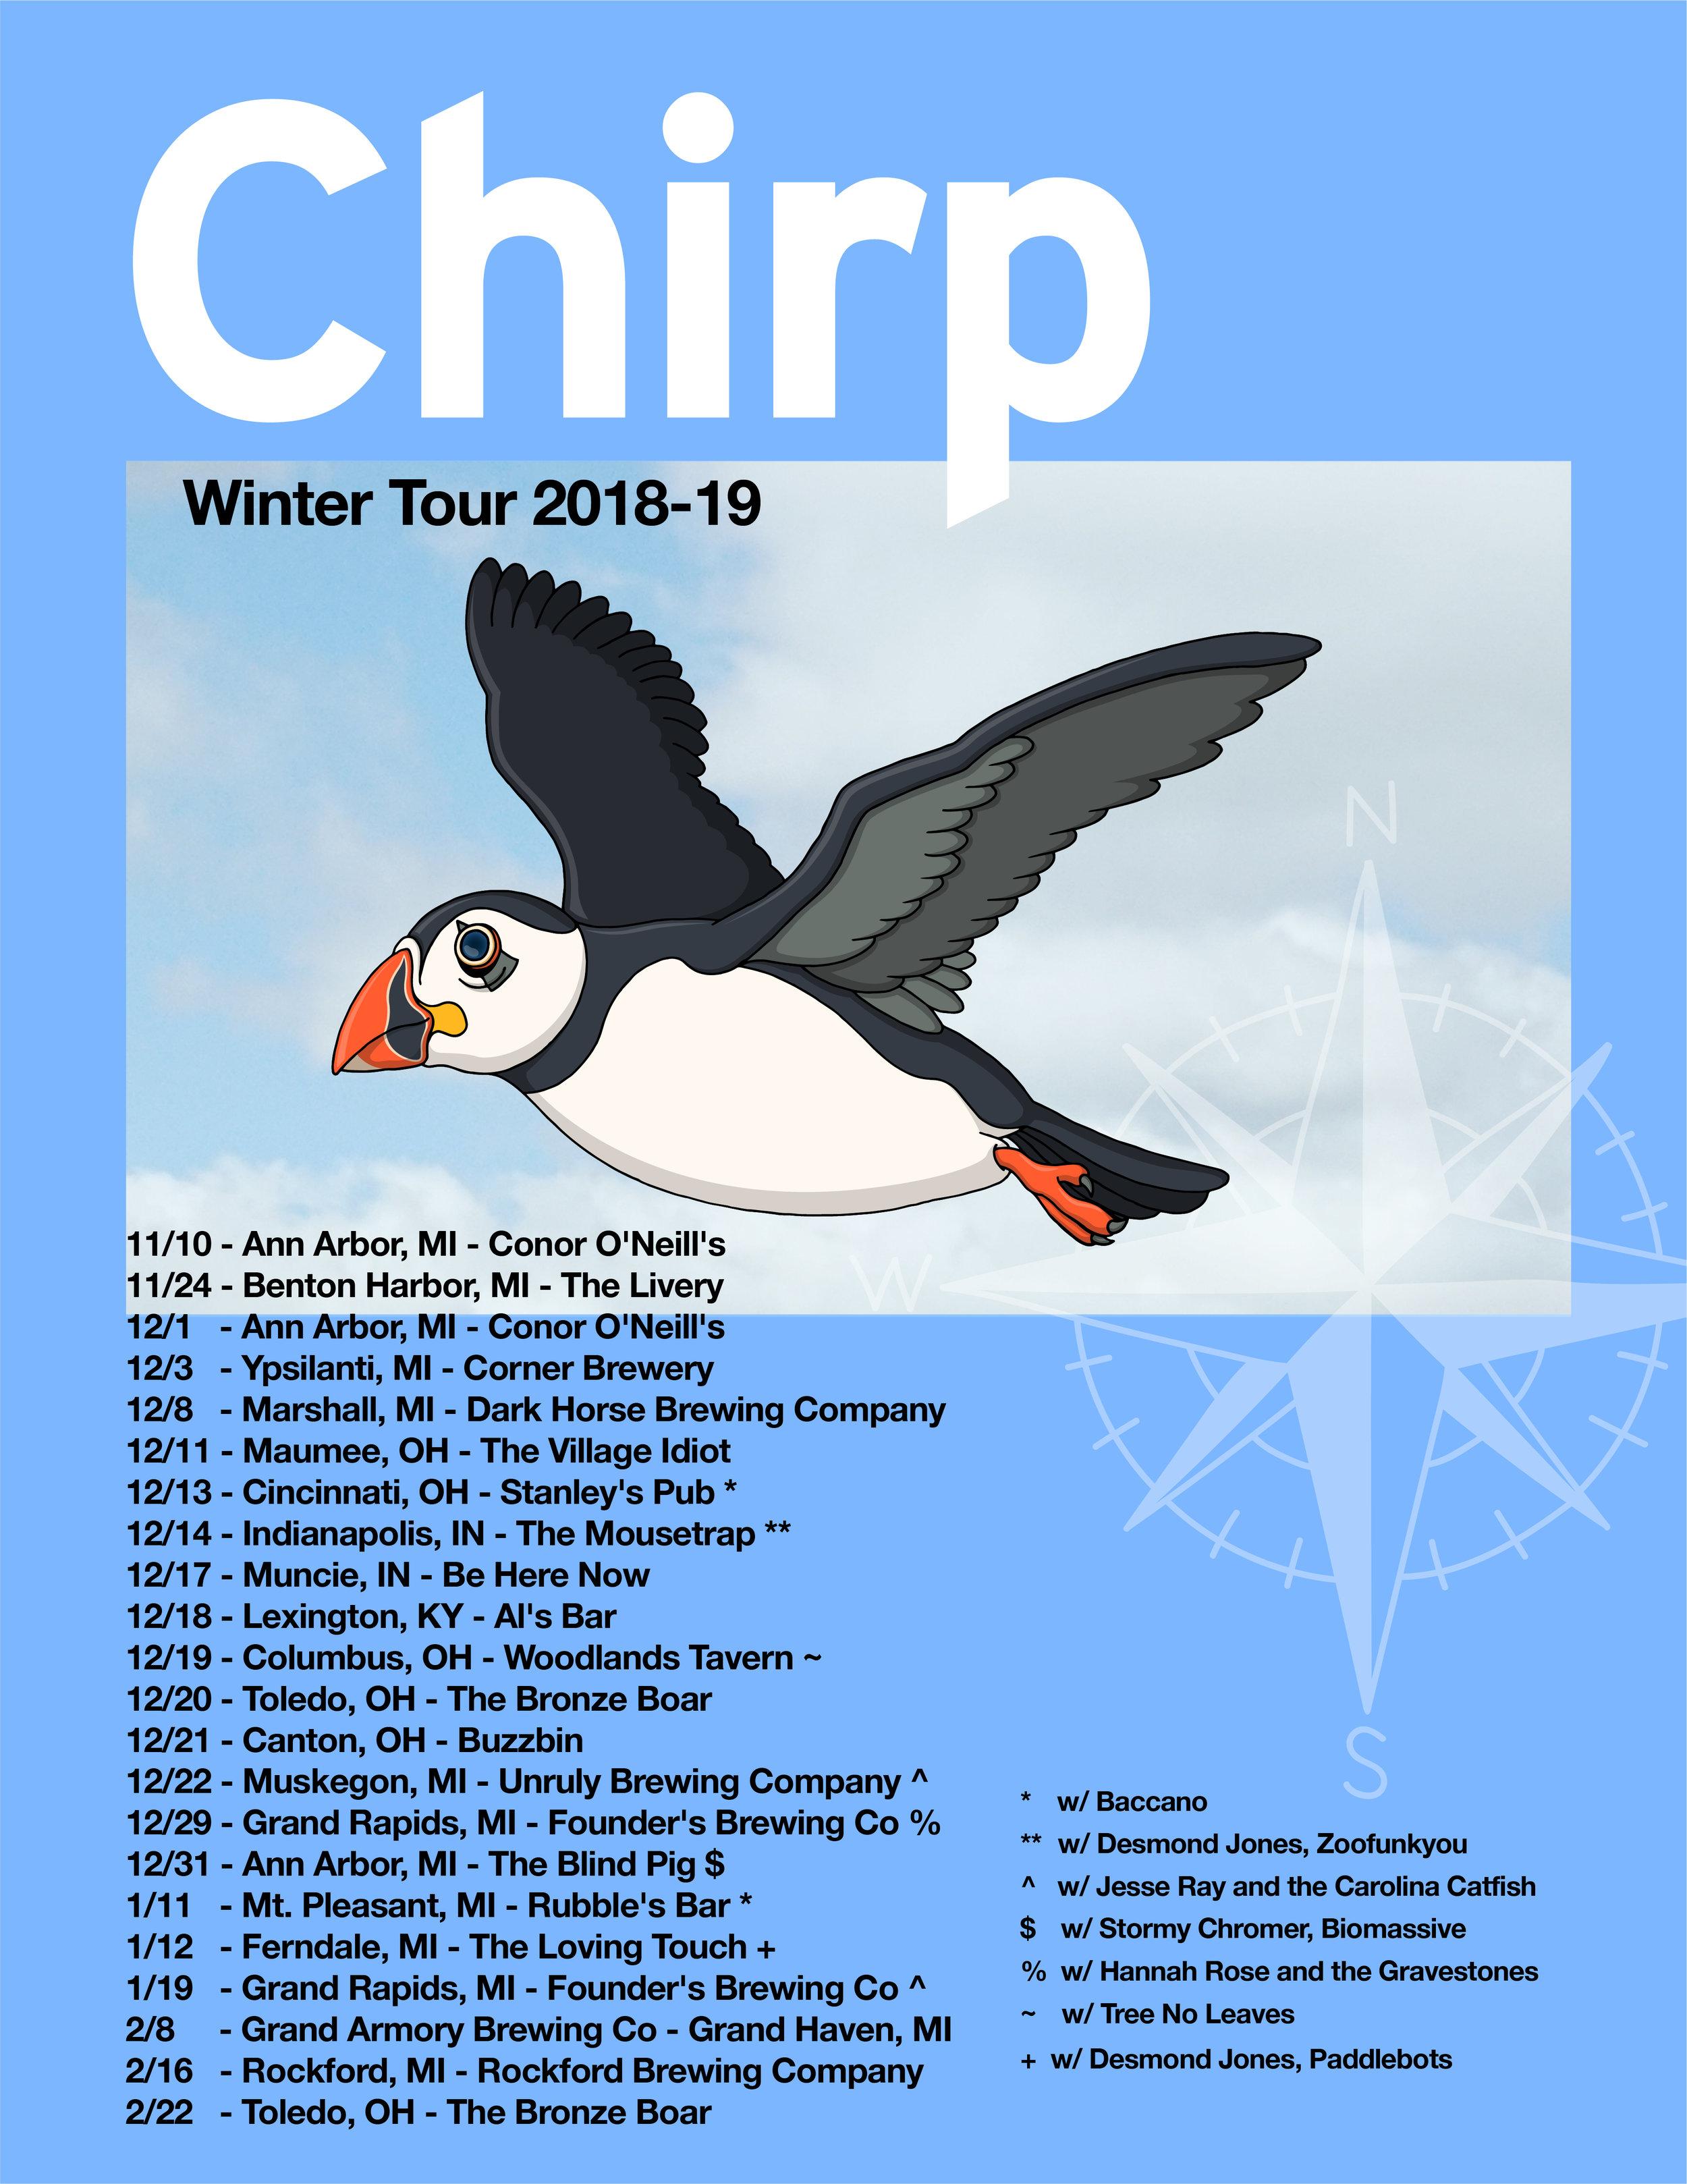 Chirp_Winter_R2-01 (1).jpg